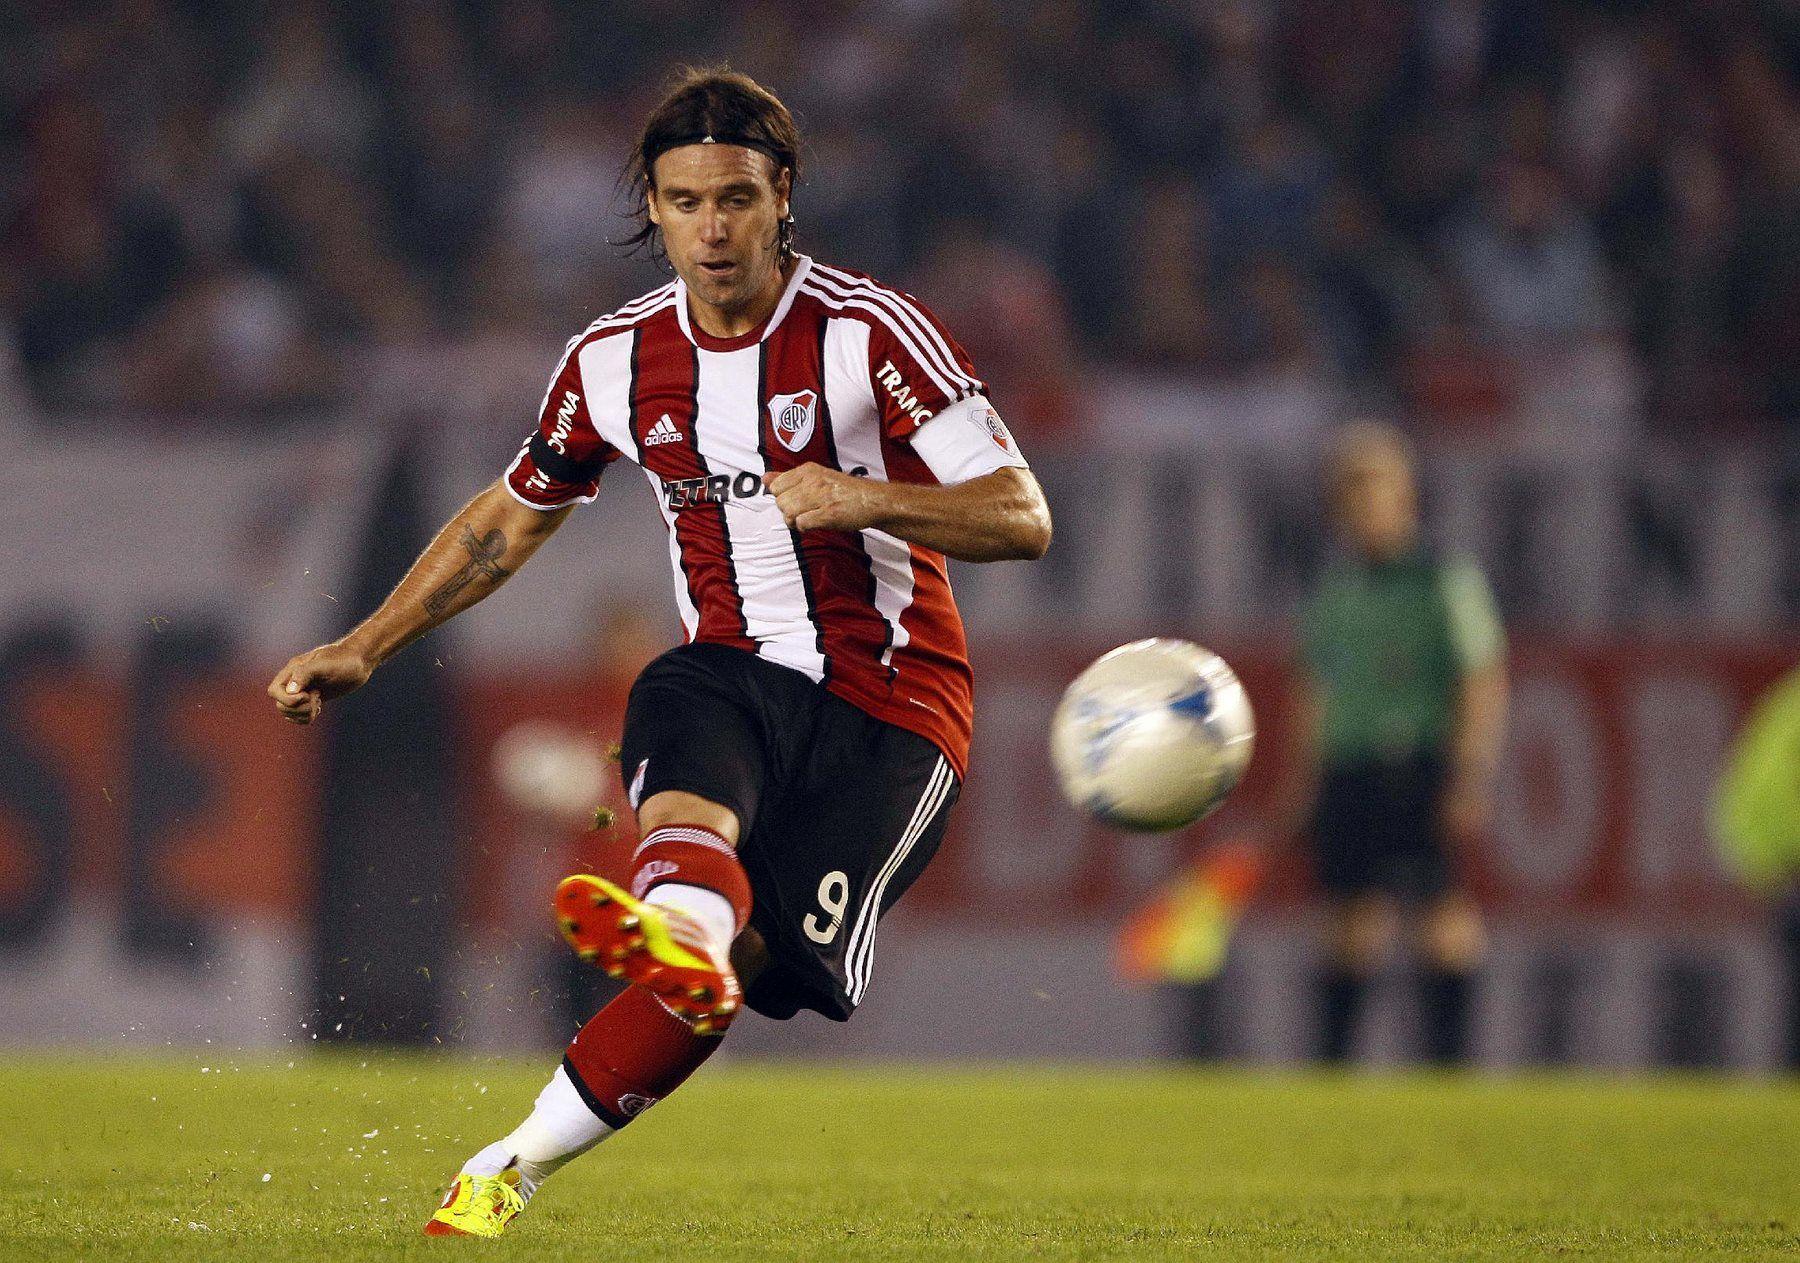 Fernando Cavenaghi #River #Gordo #Capitan #Goleador